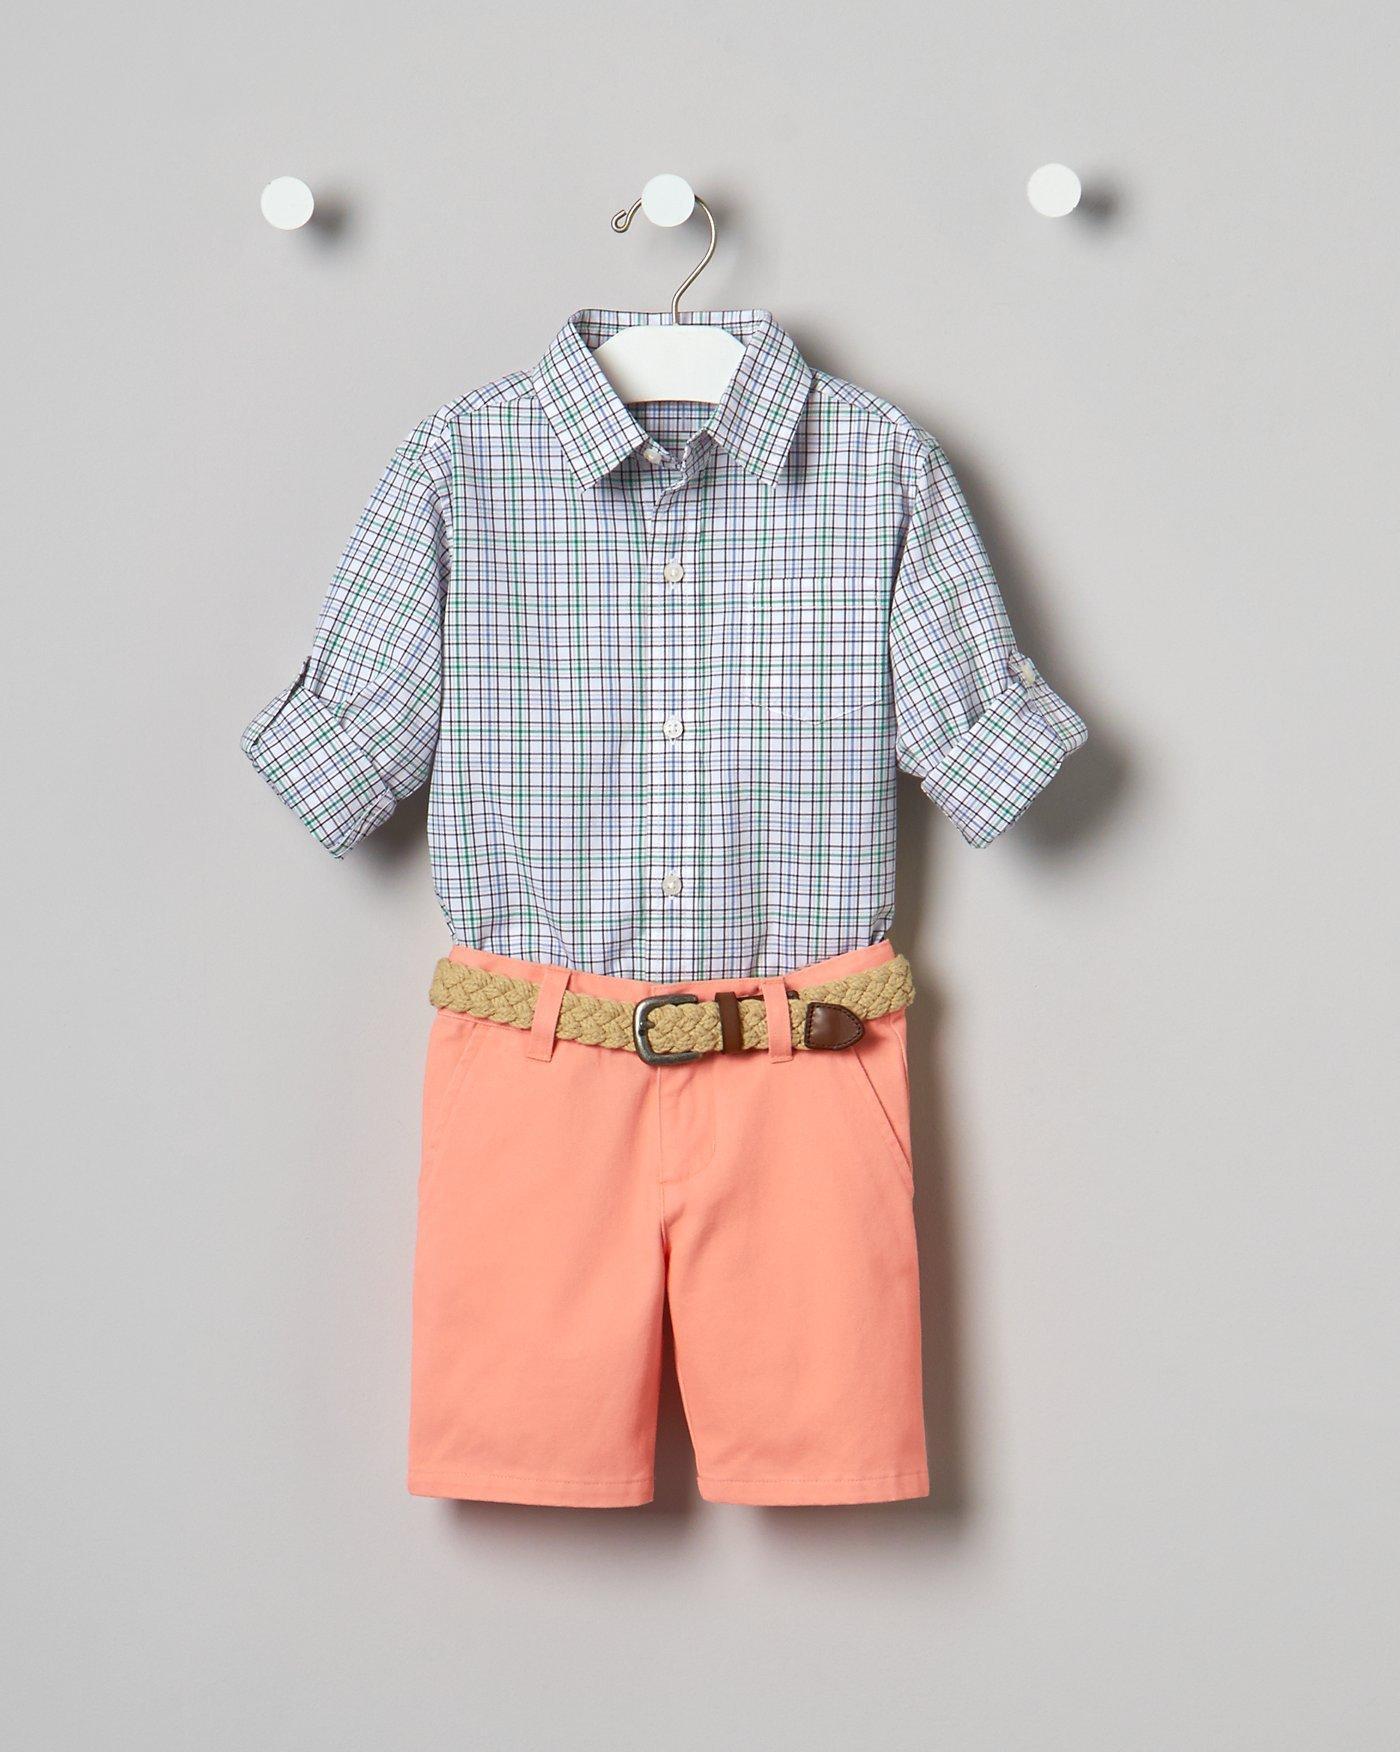 Super Cute Outfits Boys Janie Jack